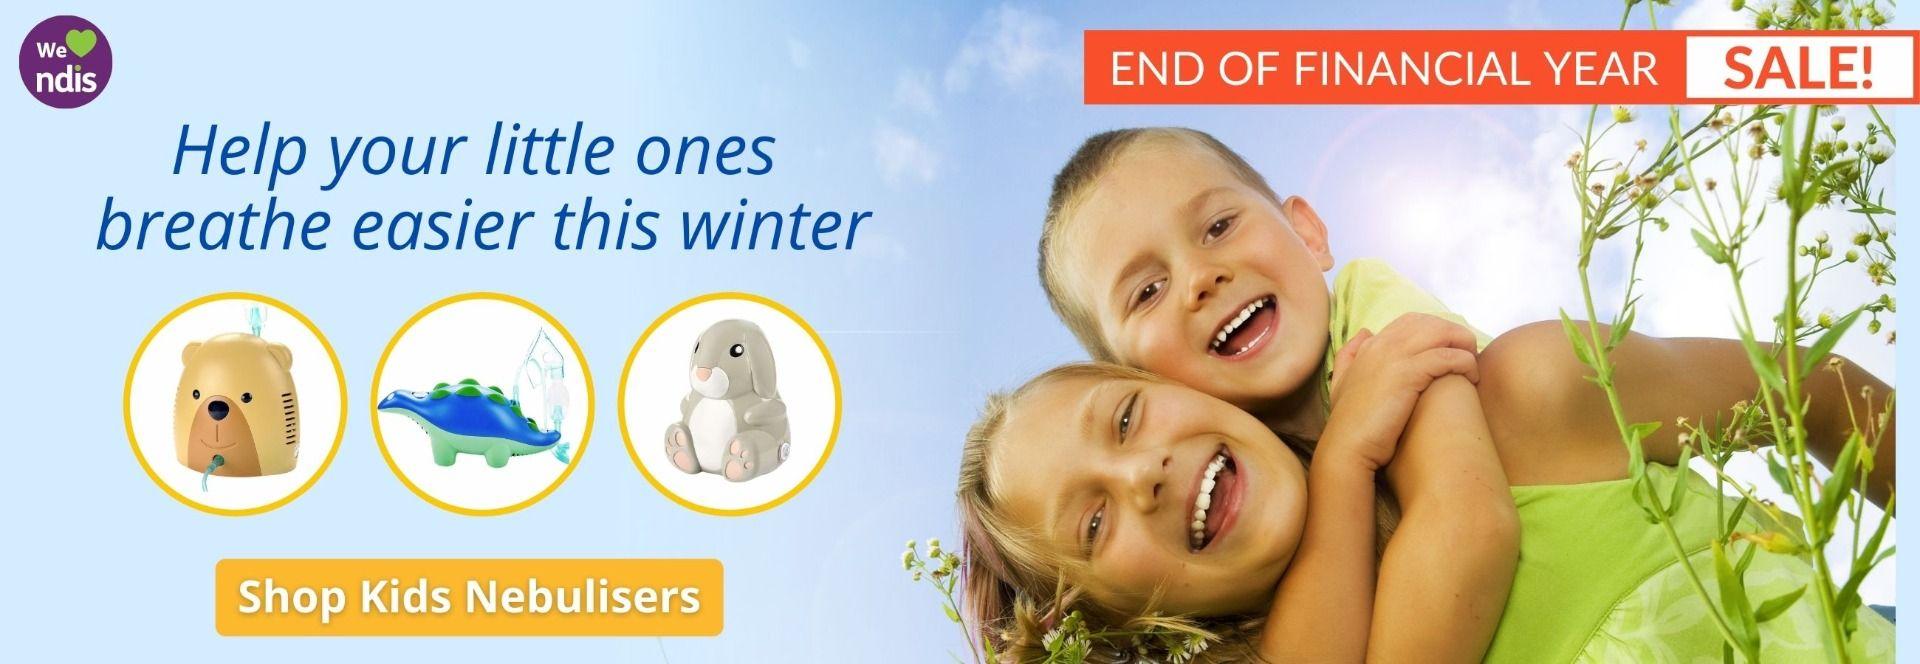 End of financial year sale - kids nebulisers